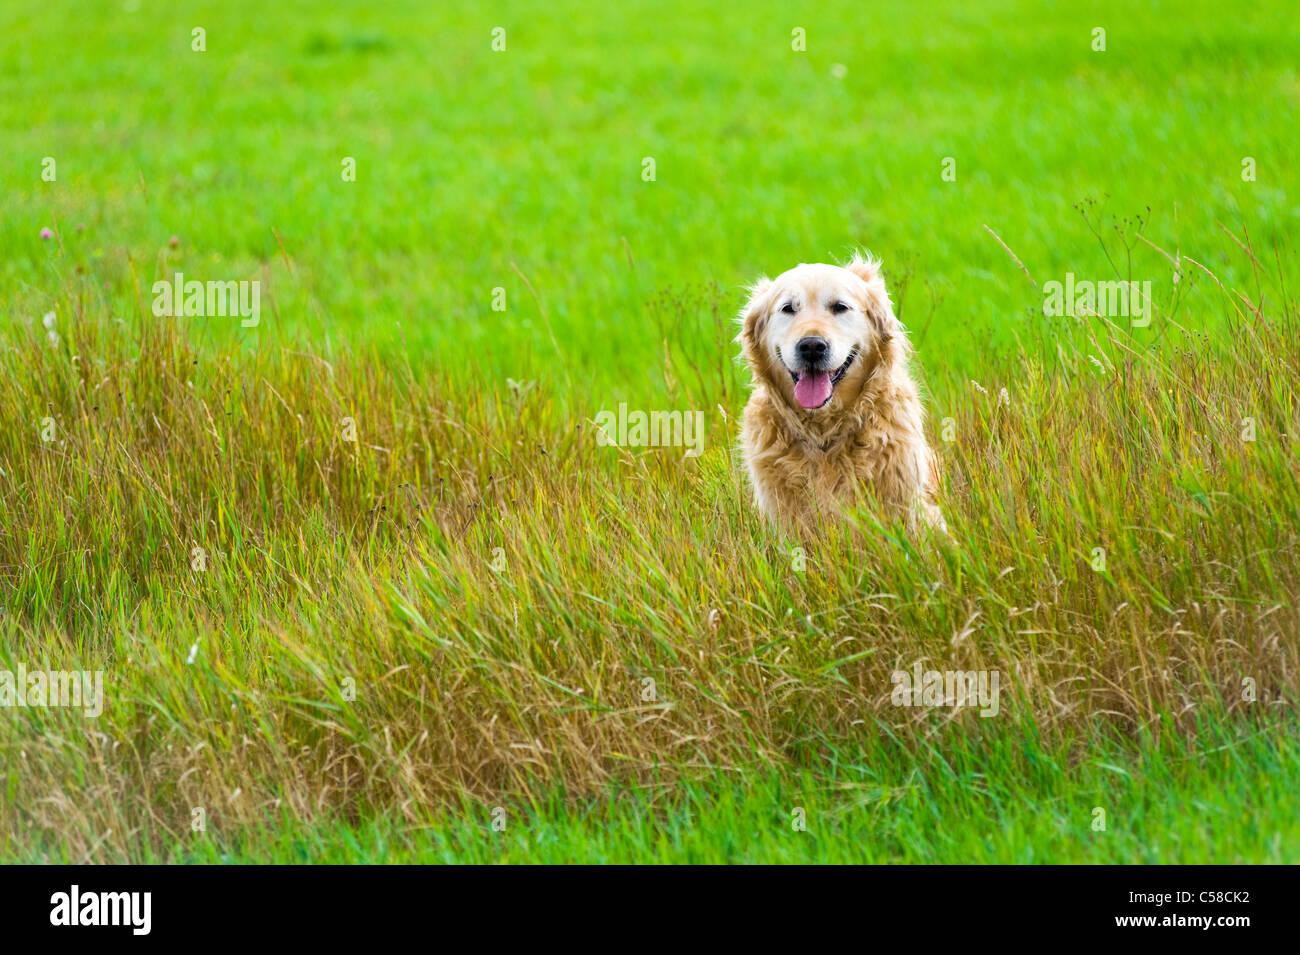 Un hermoso, viejo, hembra golden retriever tomando un descanso, se sentó en un campo mientras dando un paseo por la campiña Foto de stock